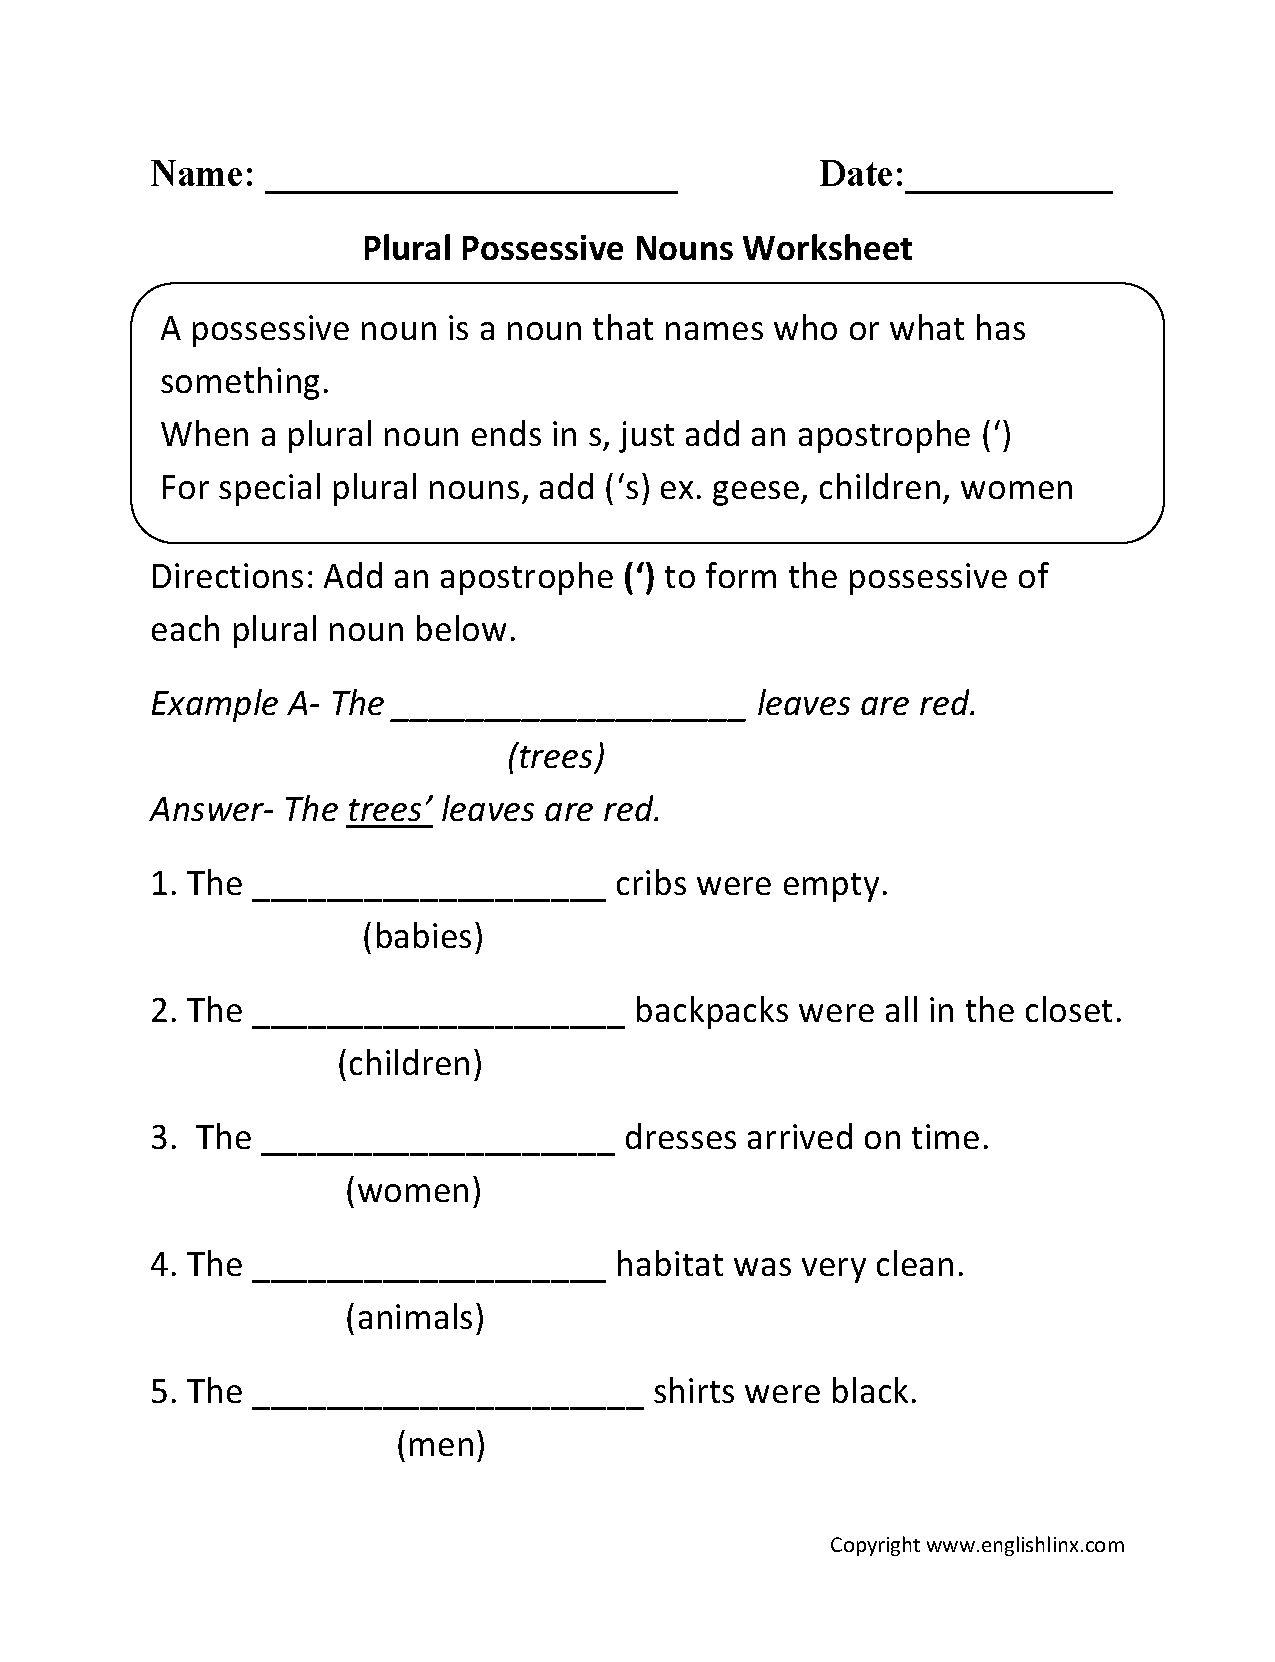 Pronoun Agreement Worksheet Pdf  Briefencounters With Pronoun Agreement Worksheet Pdf